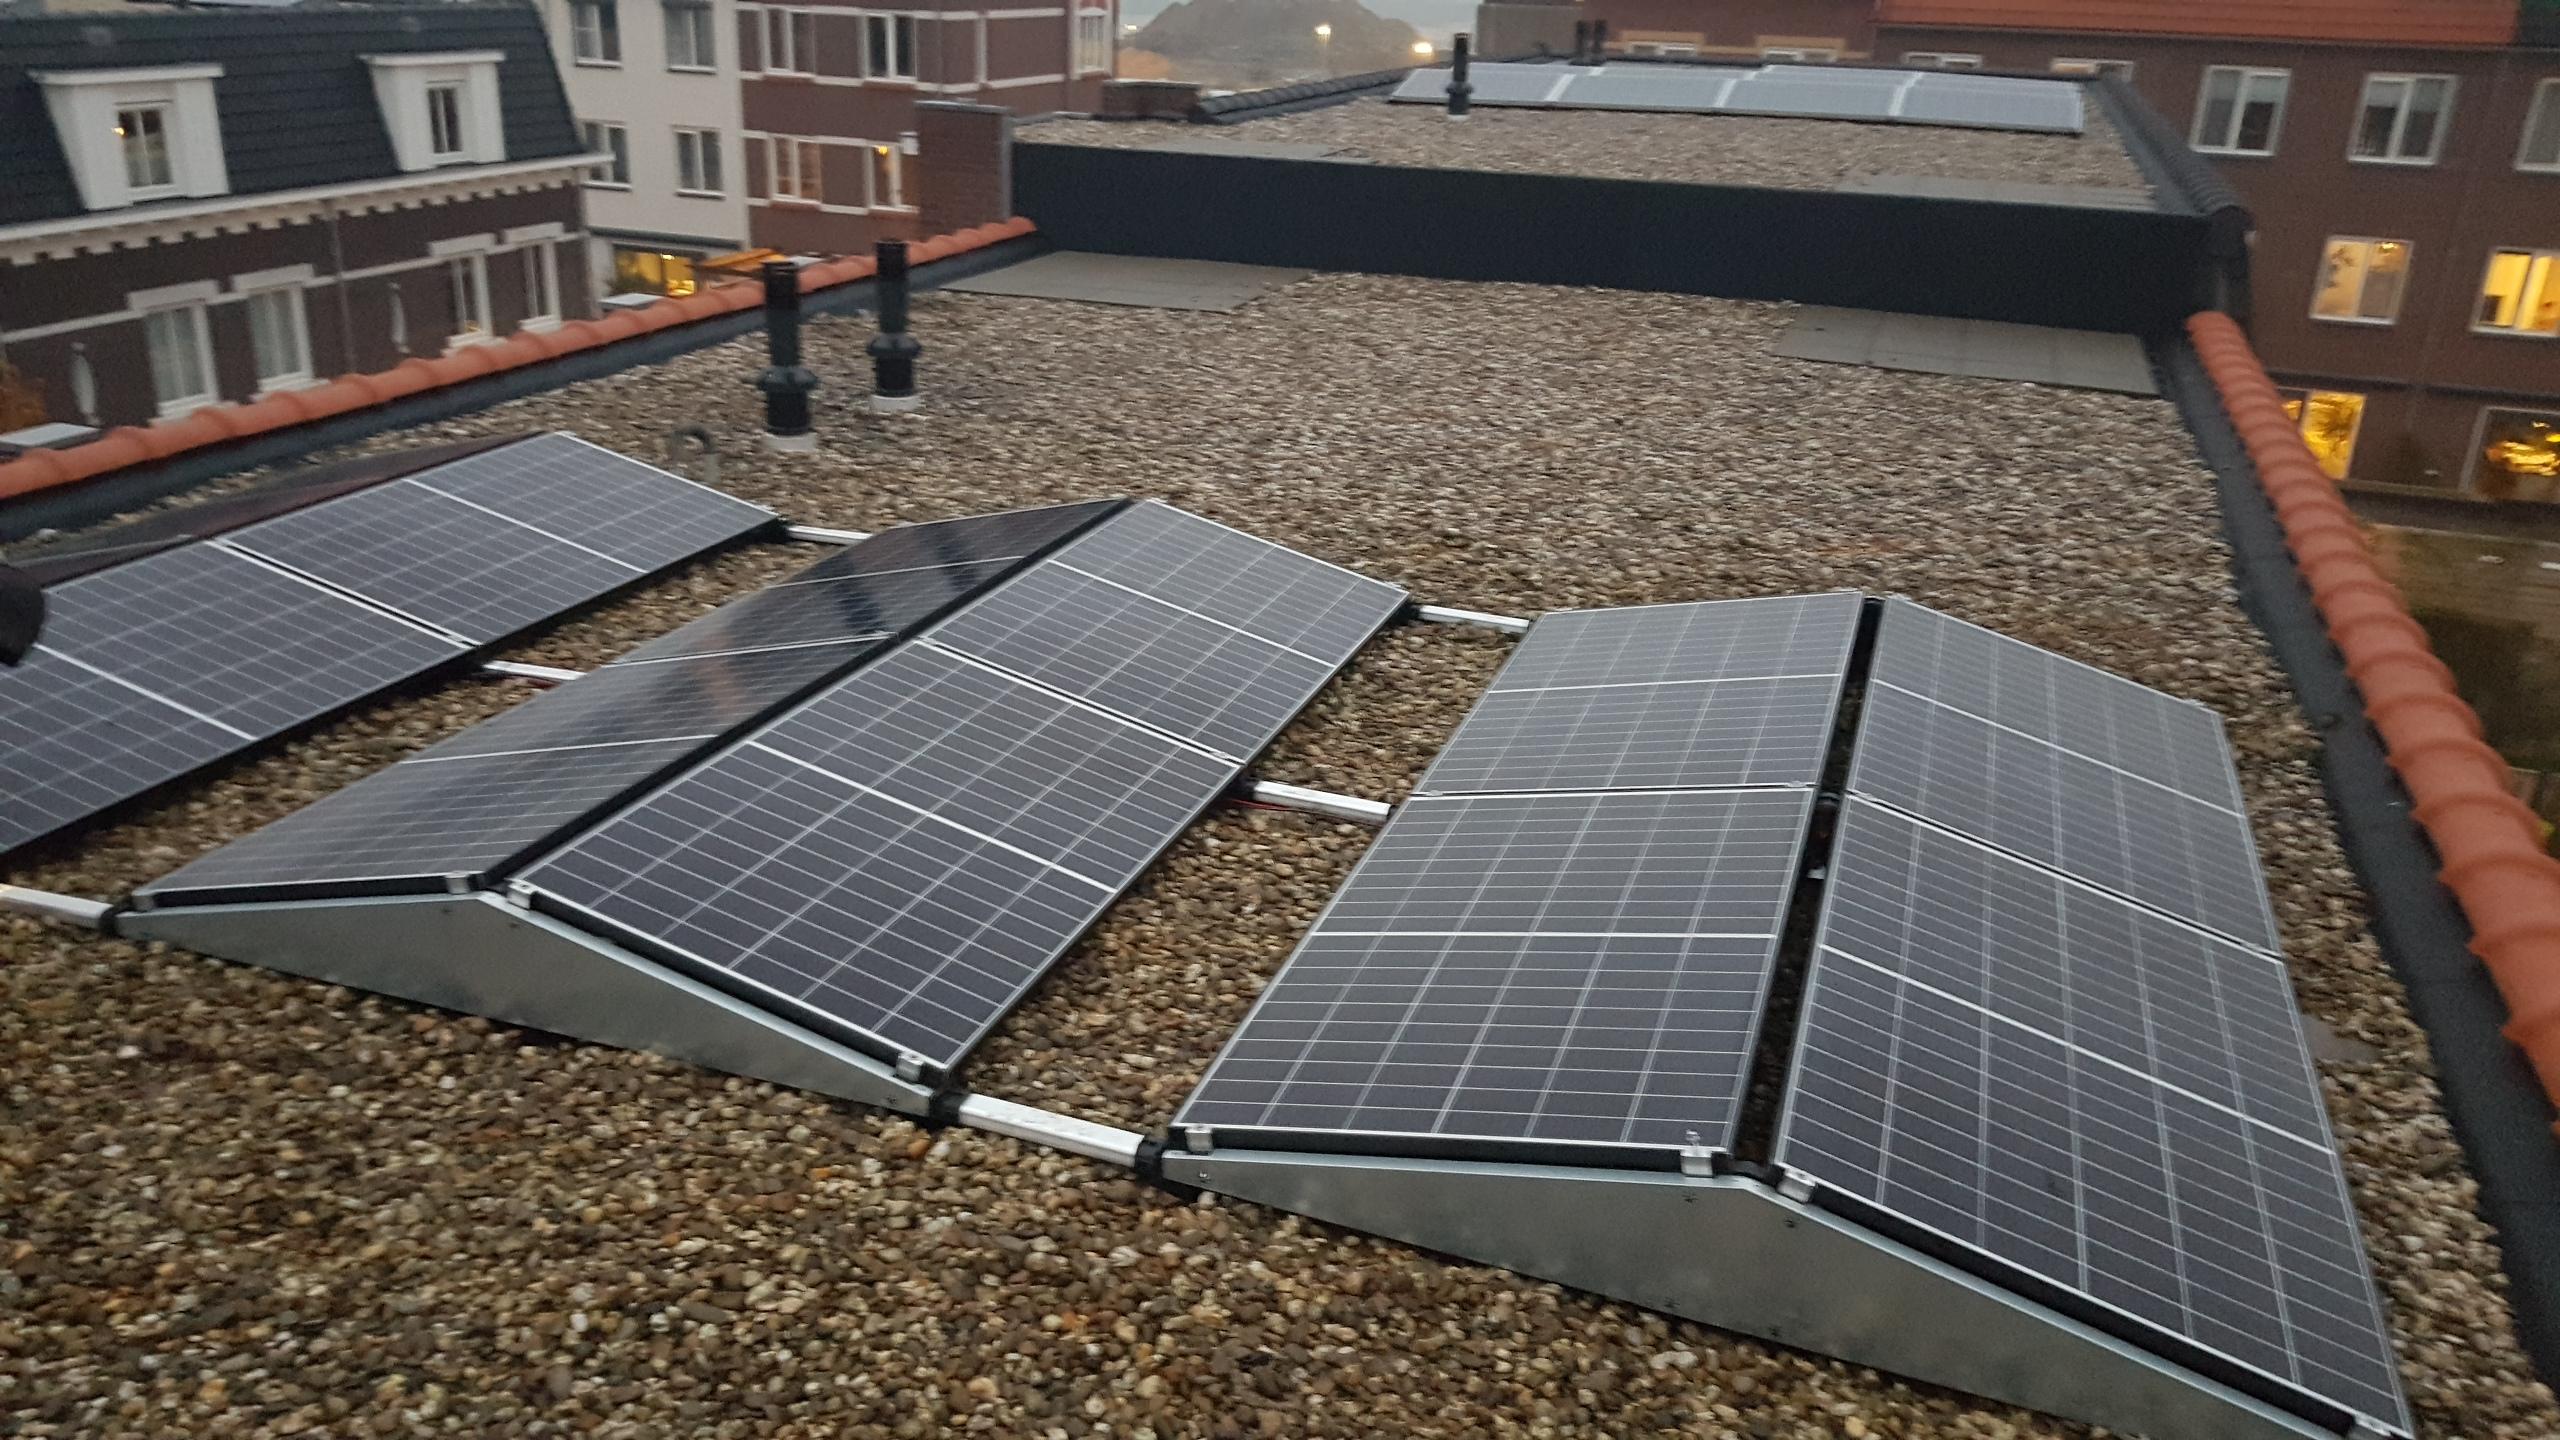 Nijmegen 12 panelen plat dak